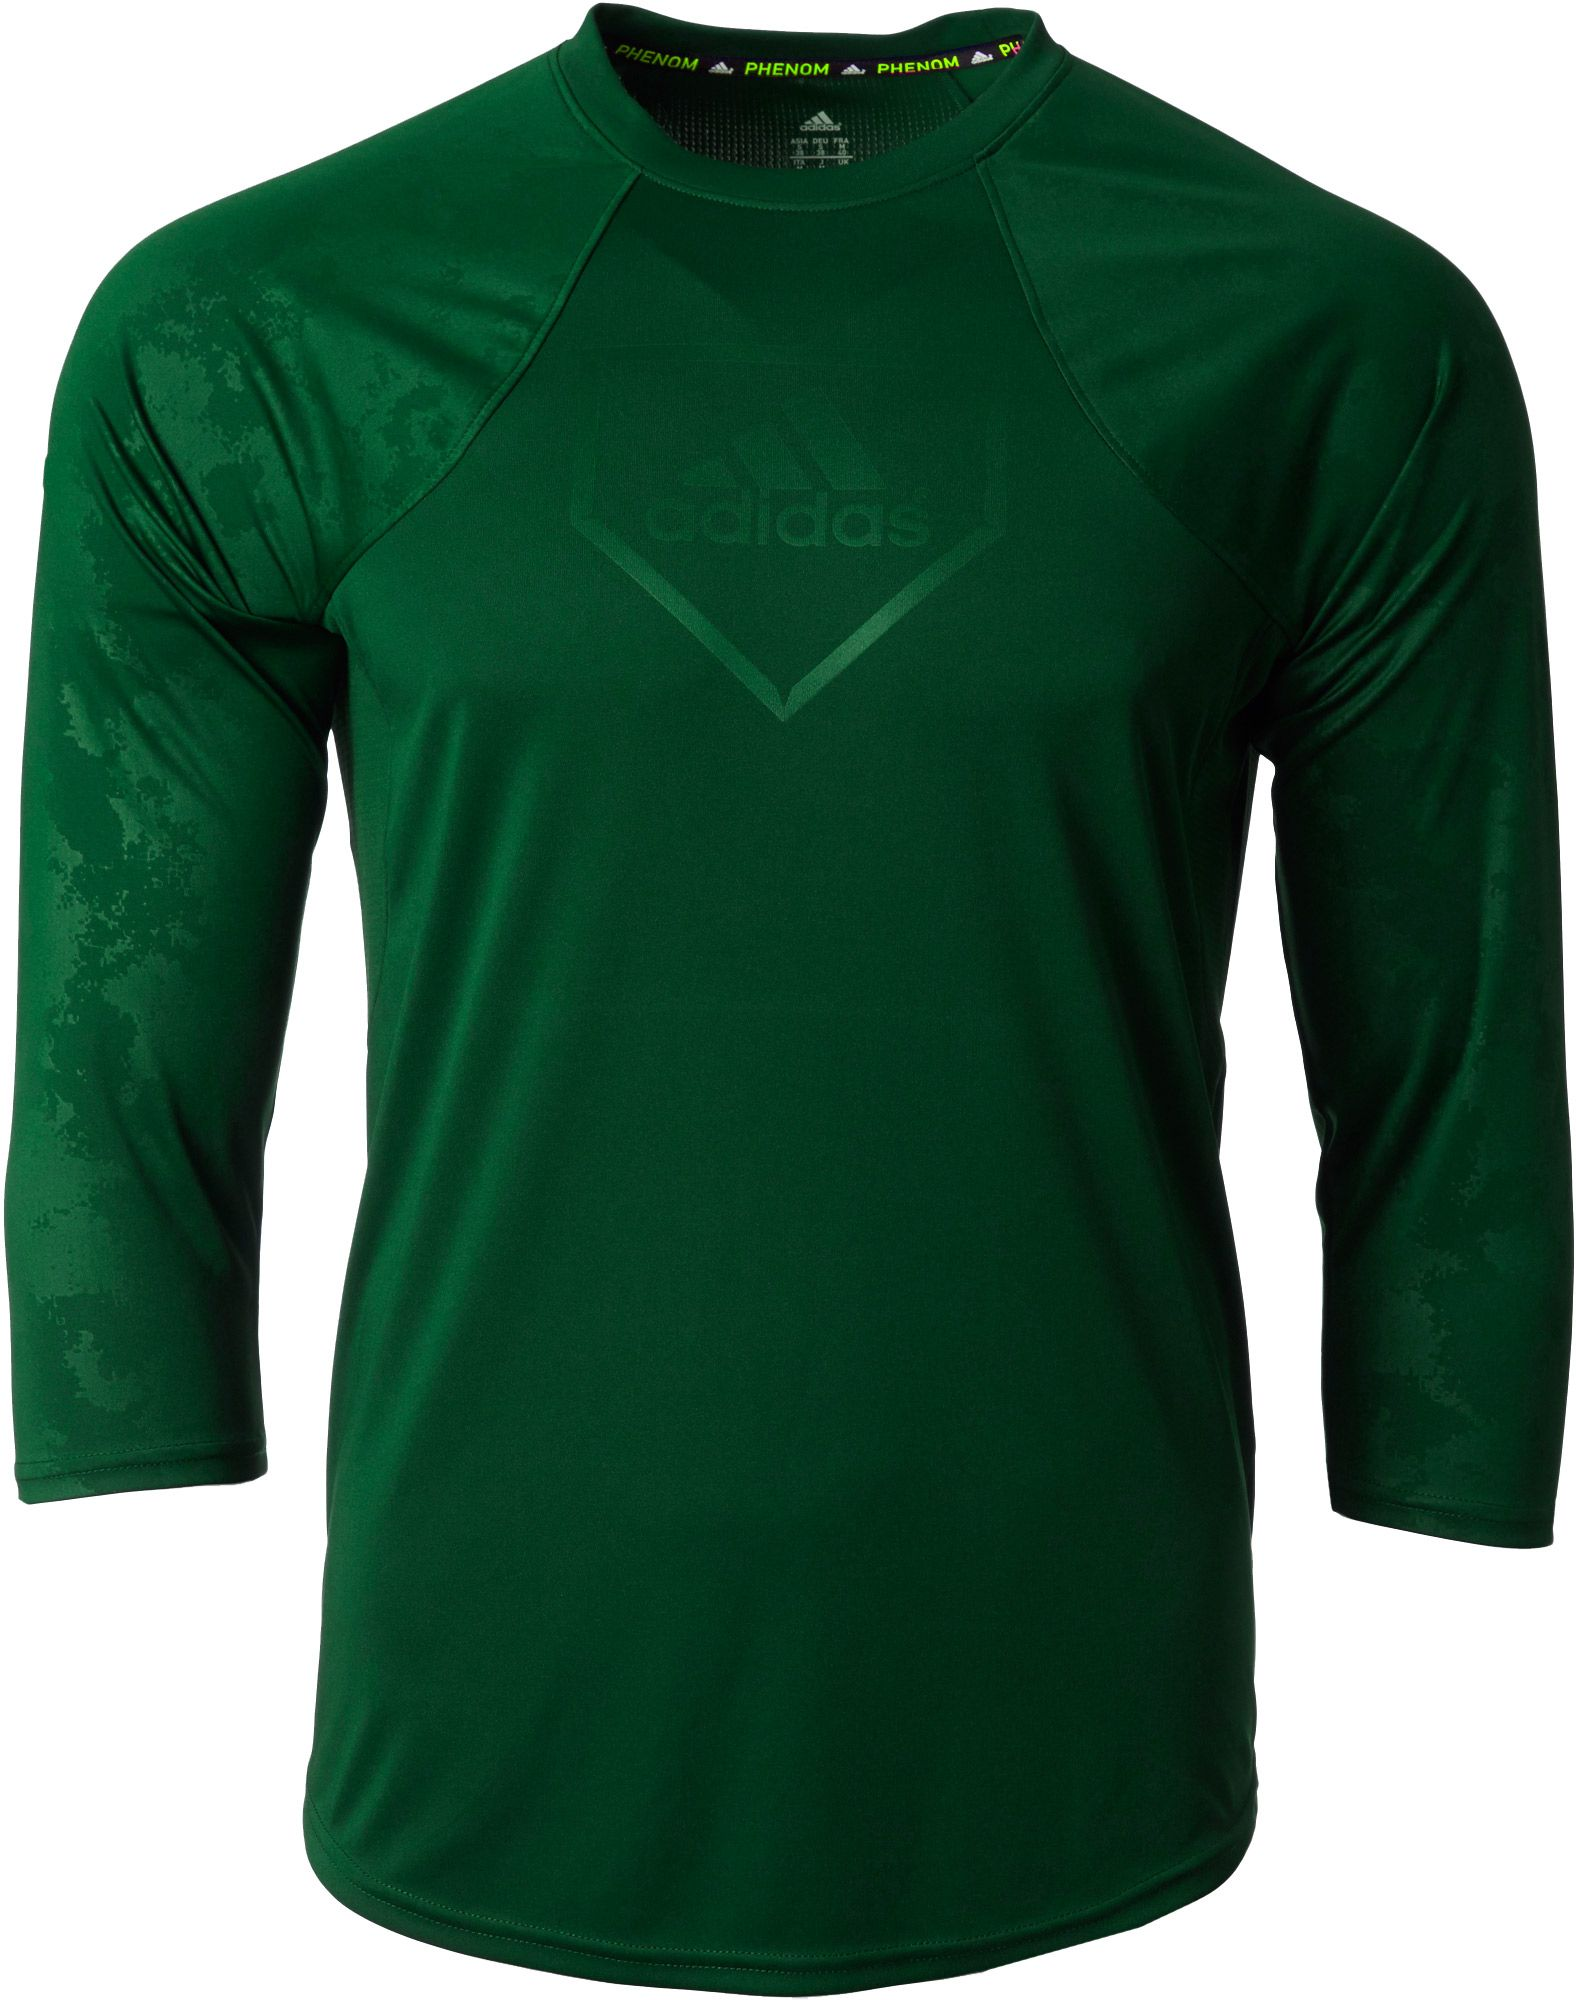 Baseball Shirts & Jackets | DICK'S Sporting Goods